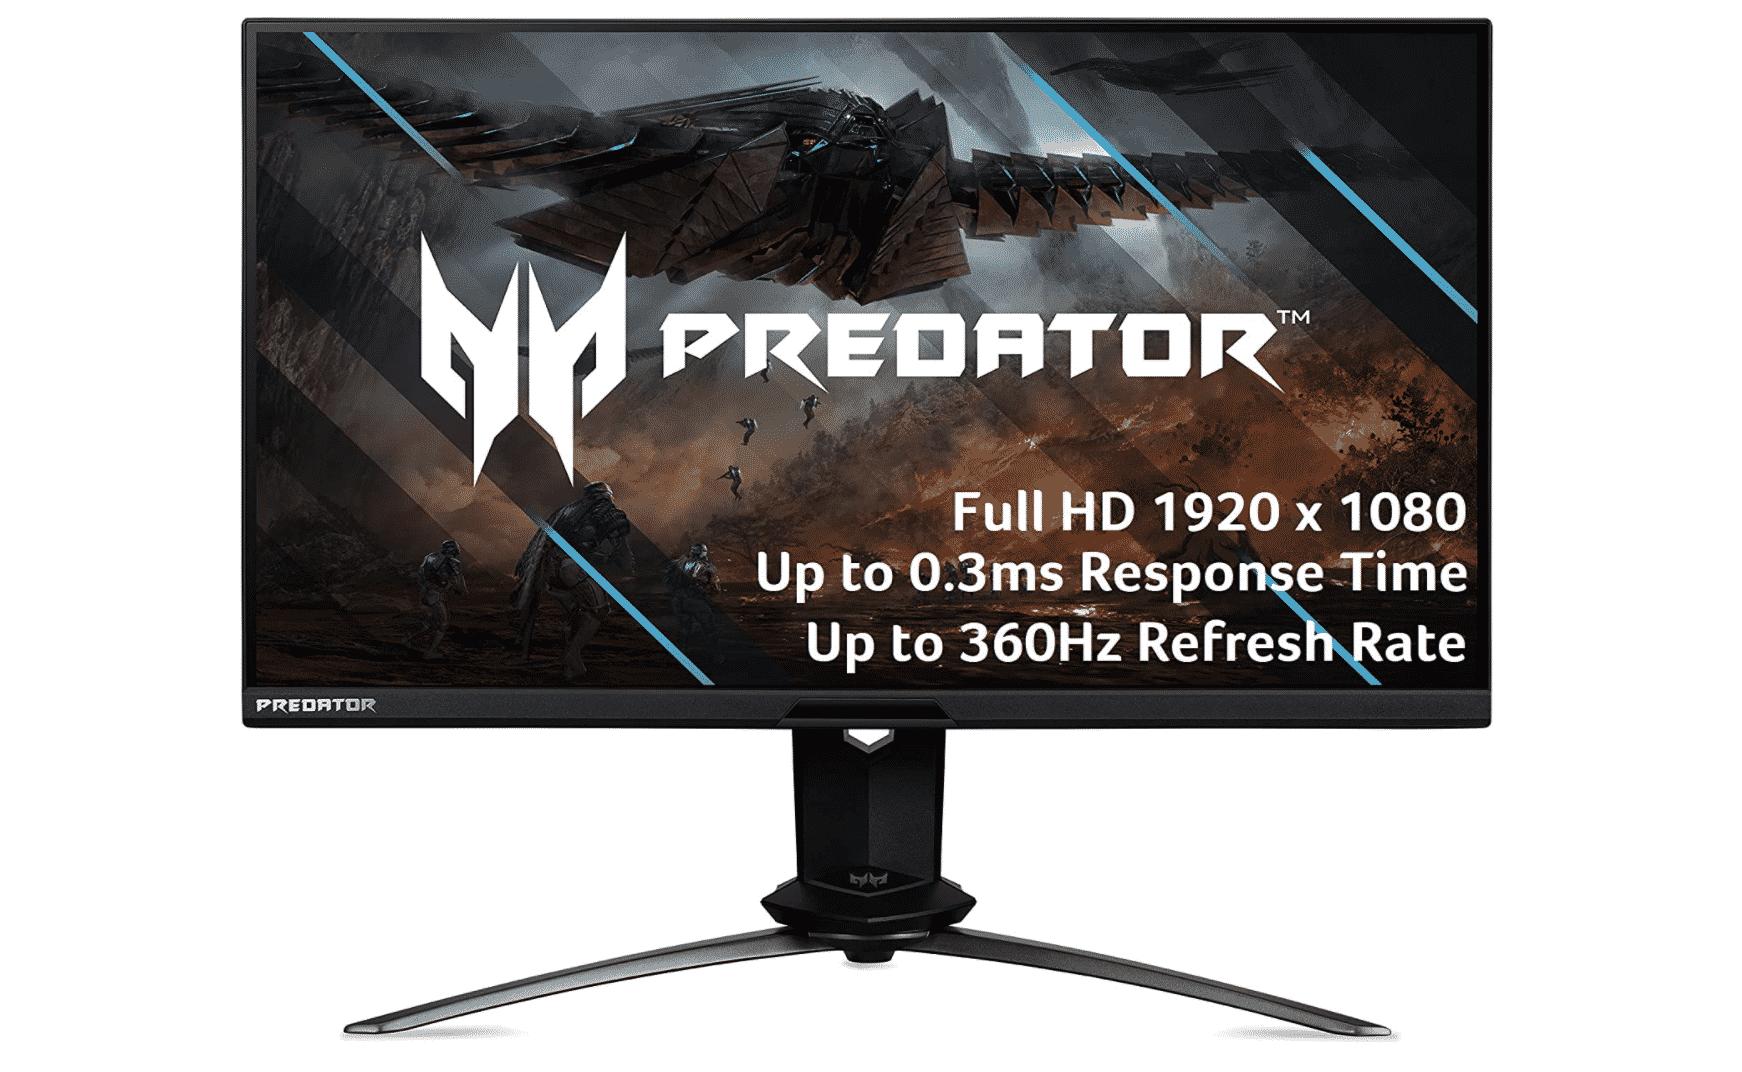 "Acer Predator X25 bmiiprzx 24.5"" FHD (1920 x 1080) Dual Drive IPS Gaming Monitor"